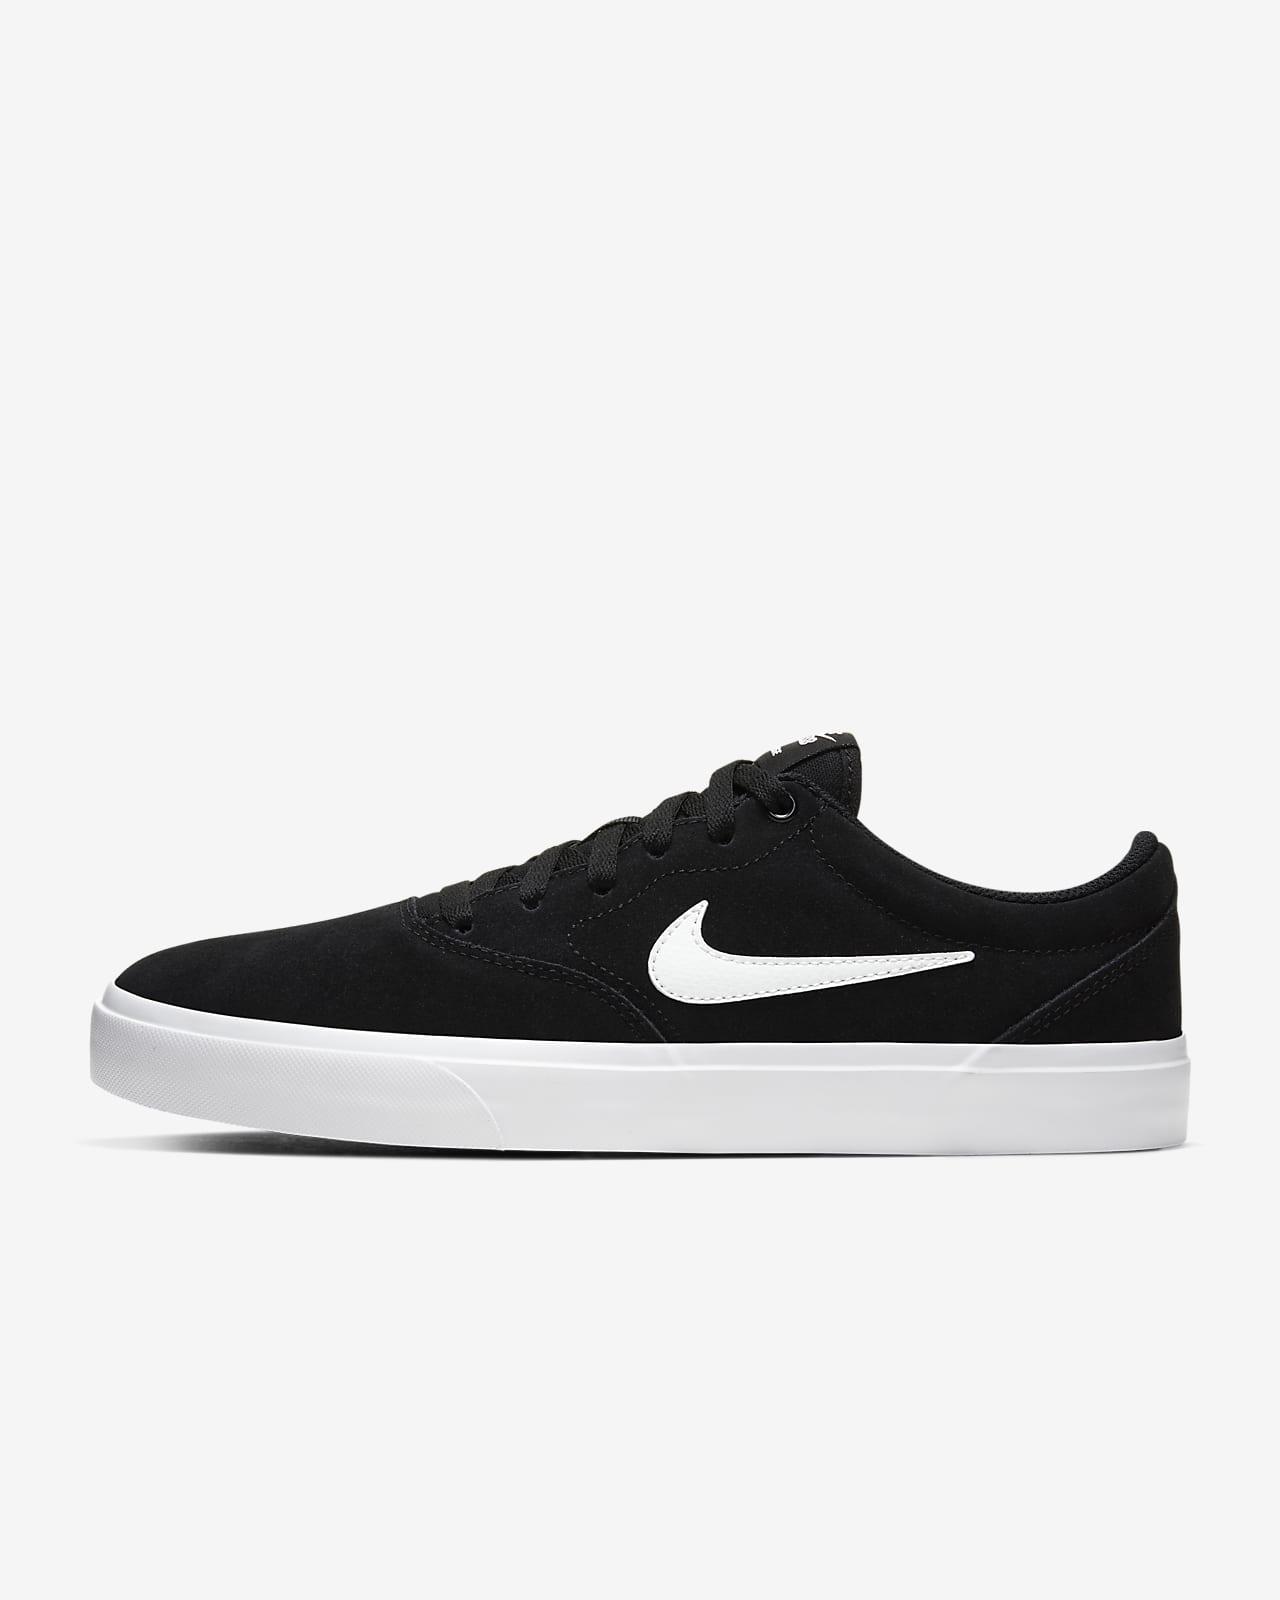 Nike SB Charge Suede Skate Shoe. Nike SA